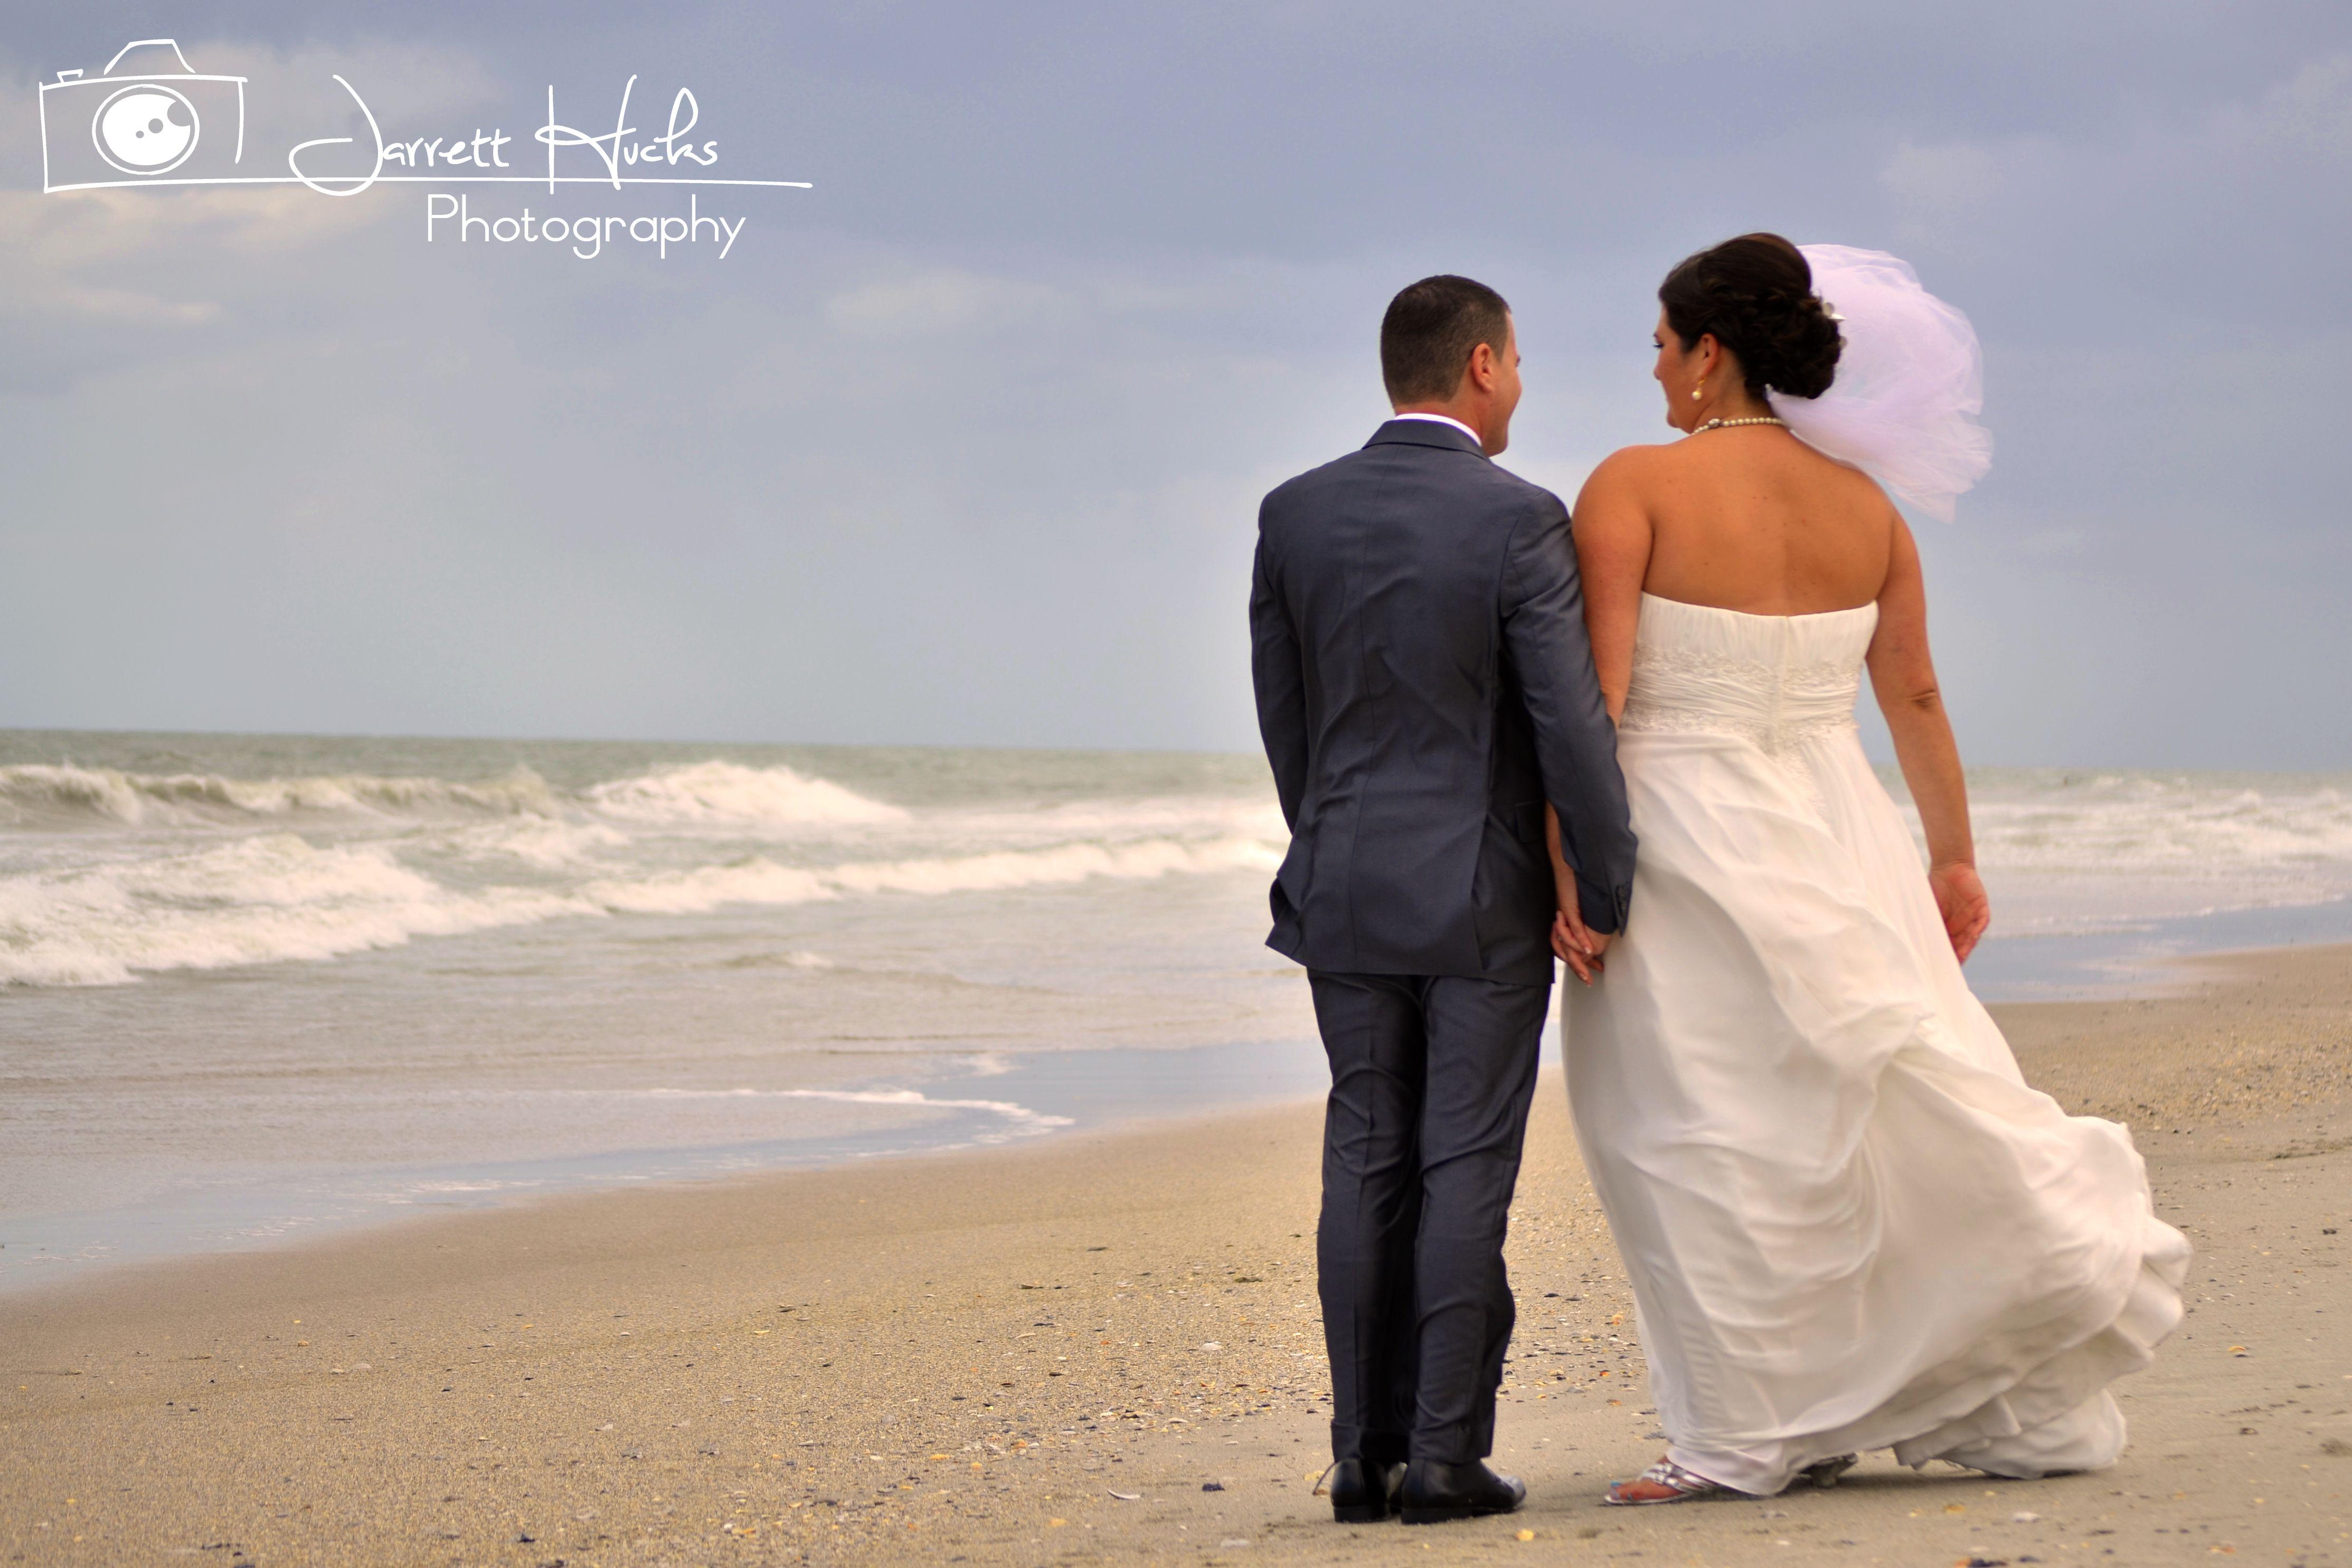 Beach wedding looks for bride  Jarrett Hucks Photography Beach wedding shot  Learning an art